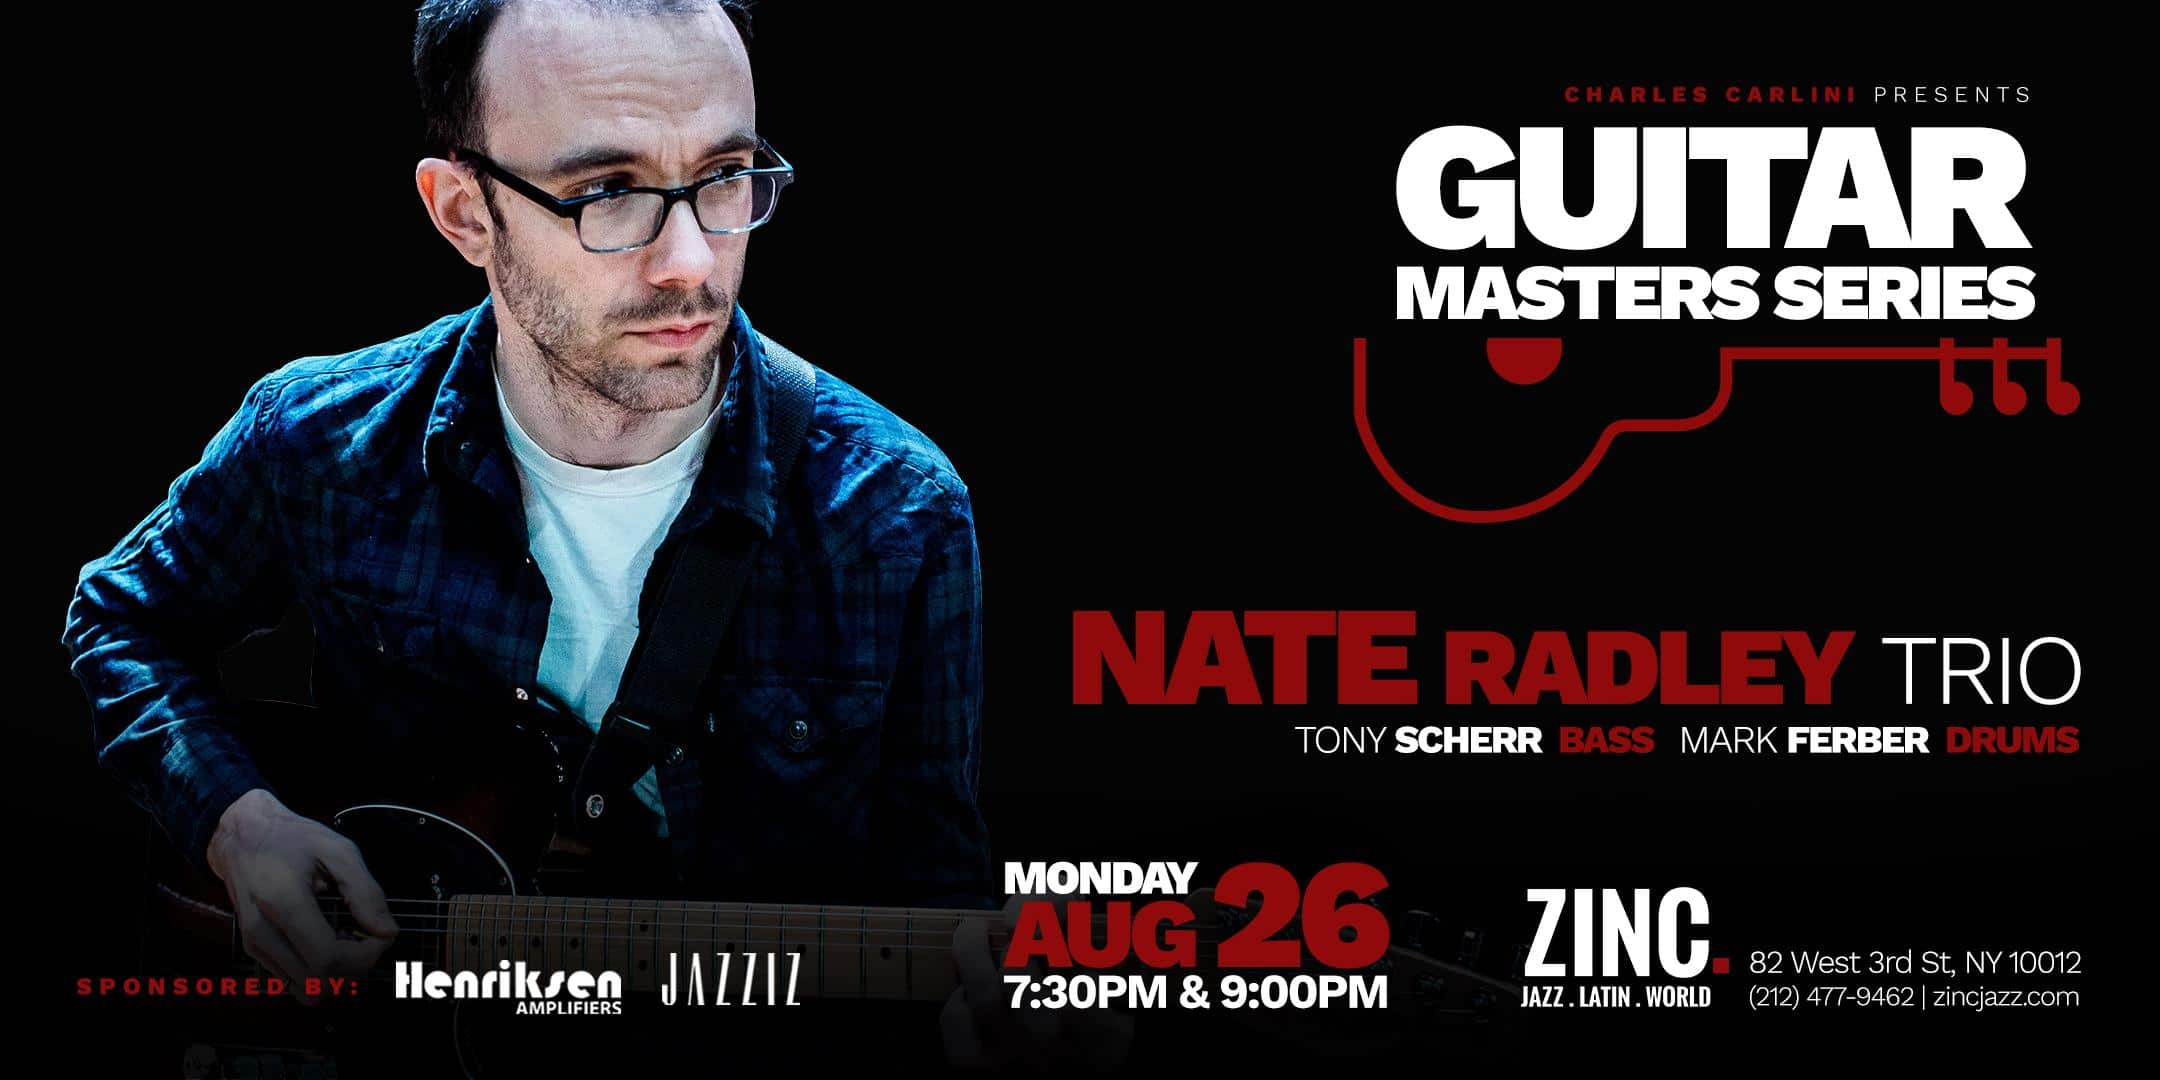 Guitar Masters Series: Nate Radley